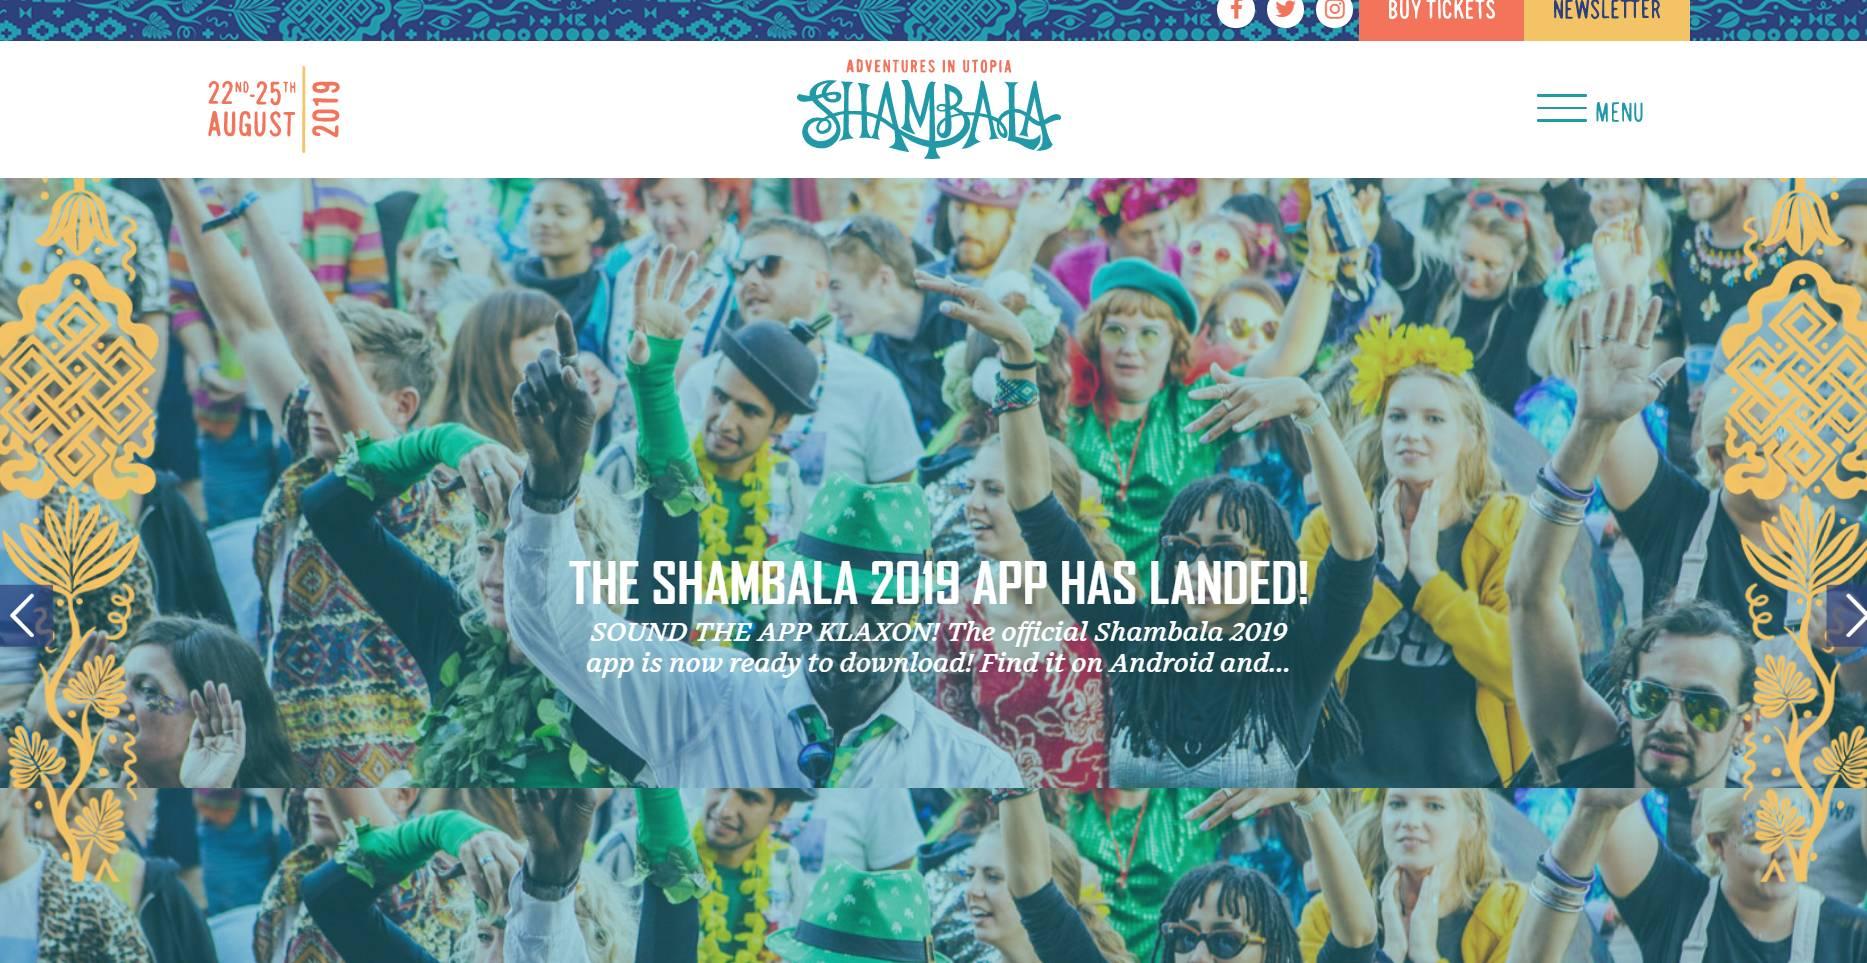 Home_-_Shambala_-_2019-08-19_16.31.38.jpg